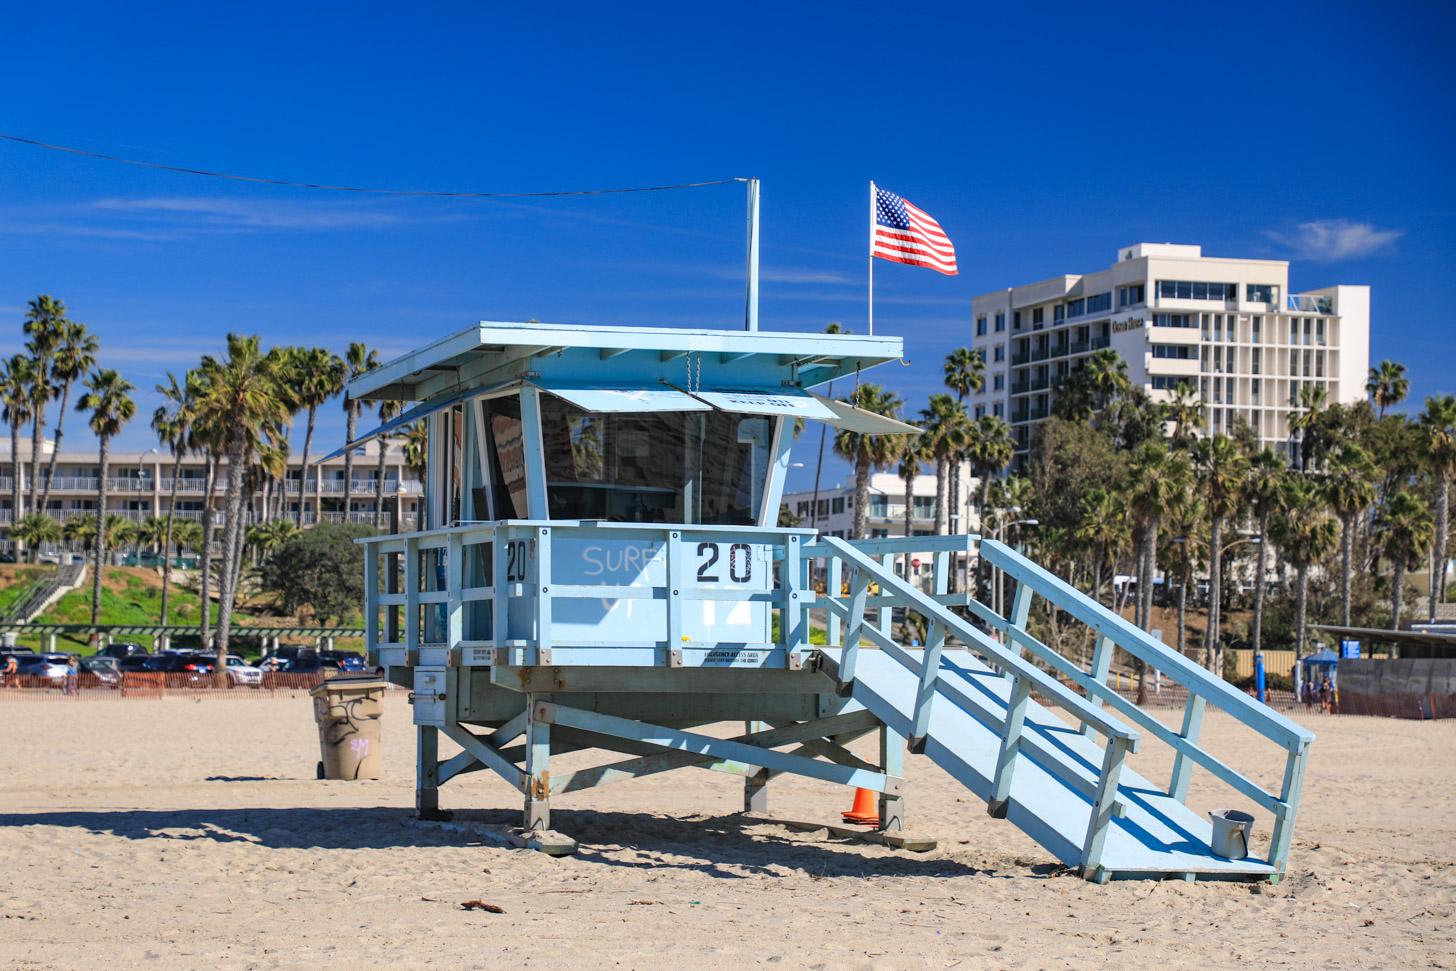 Een typisch strandwachthuisje op Santa Monica Beach